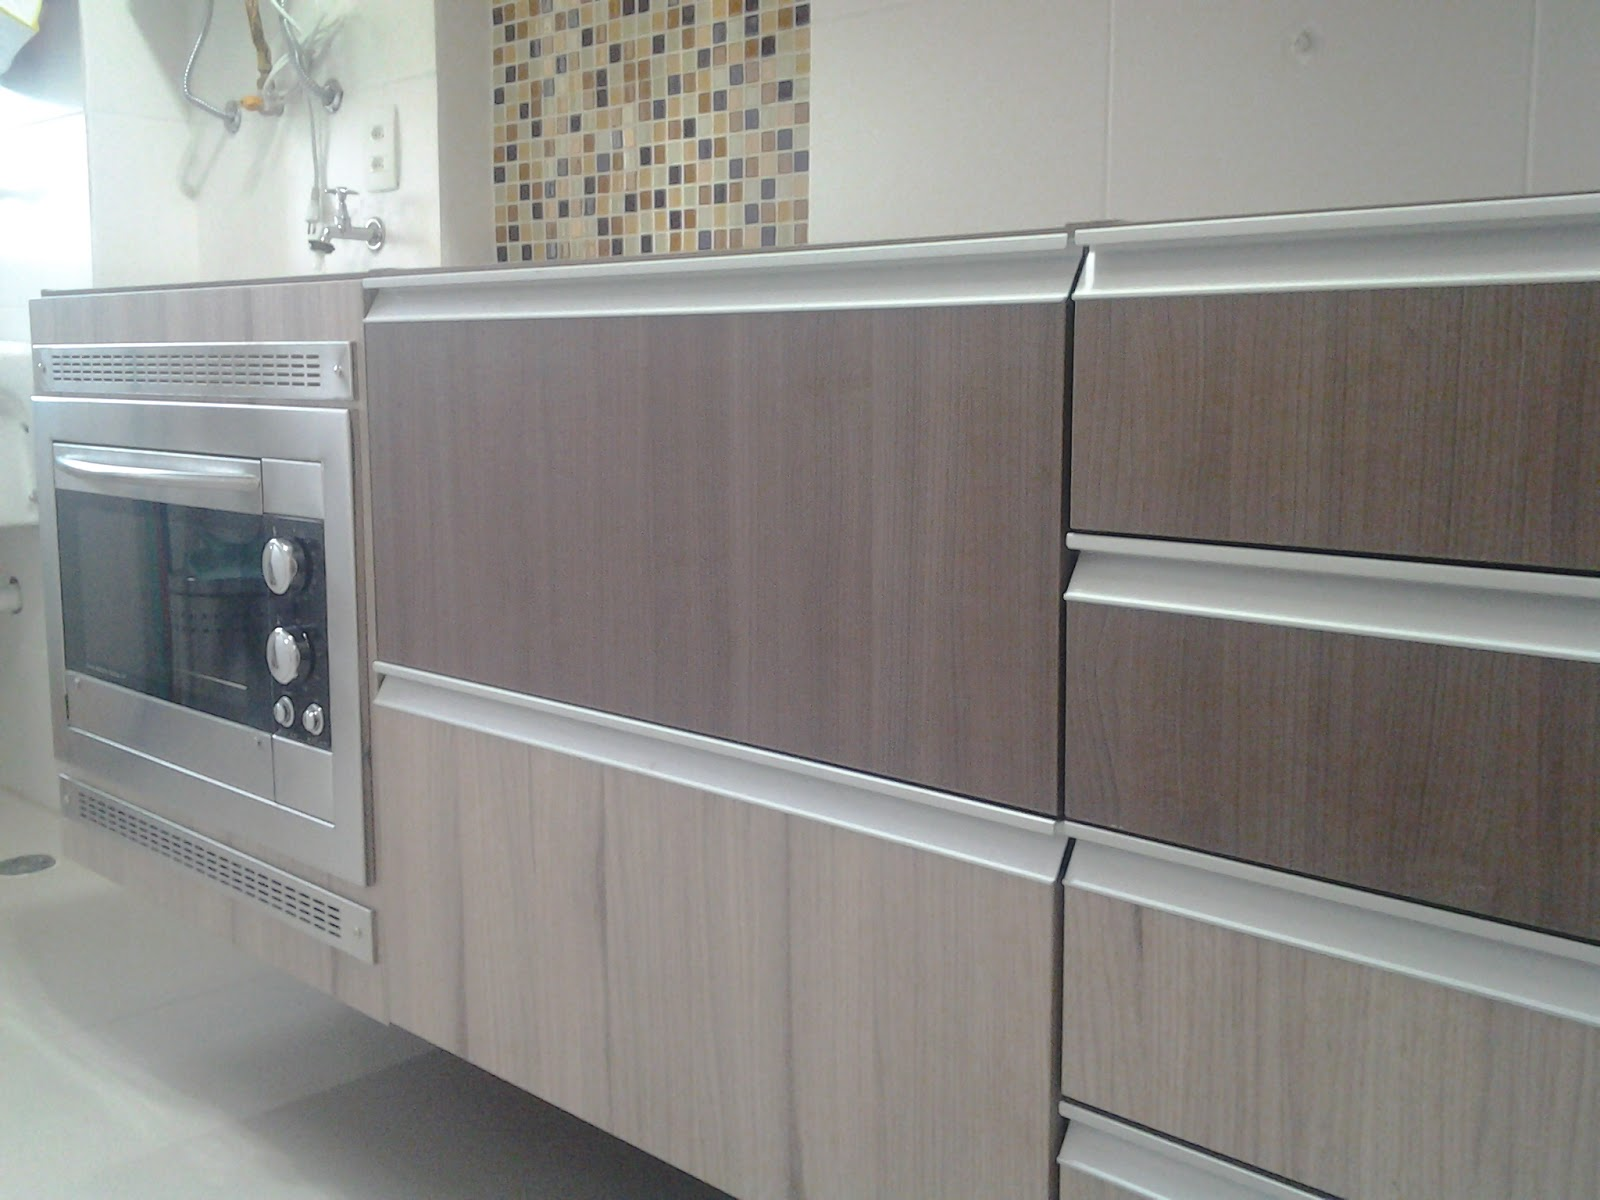 gabinete ja com forno elétrico fischer instalado esse gabinete tem  #736958 1600 1200